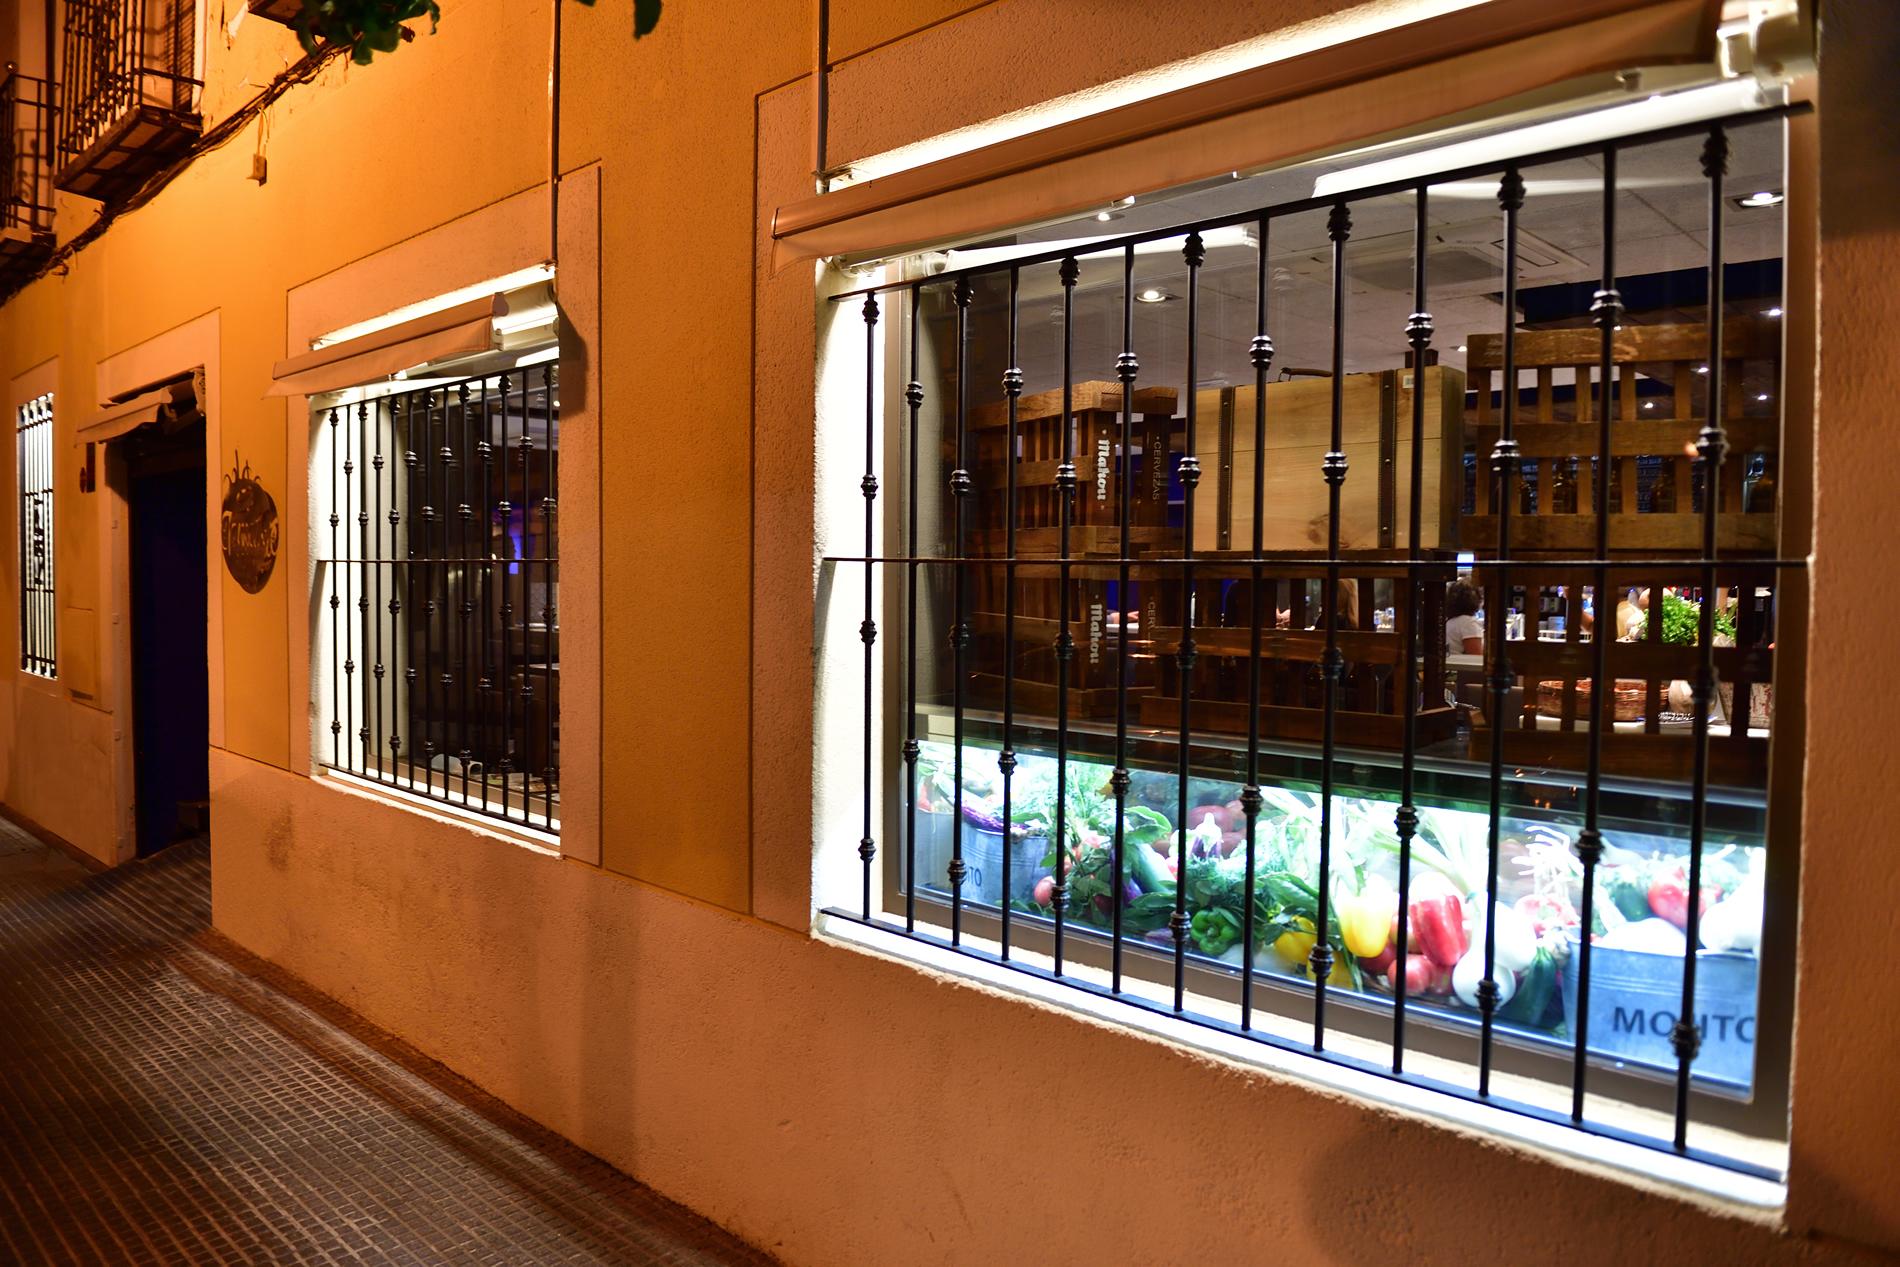 fachada nocturna el tomate de aranjuez - Restaurante en Aranjuez